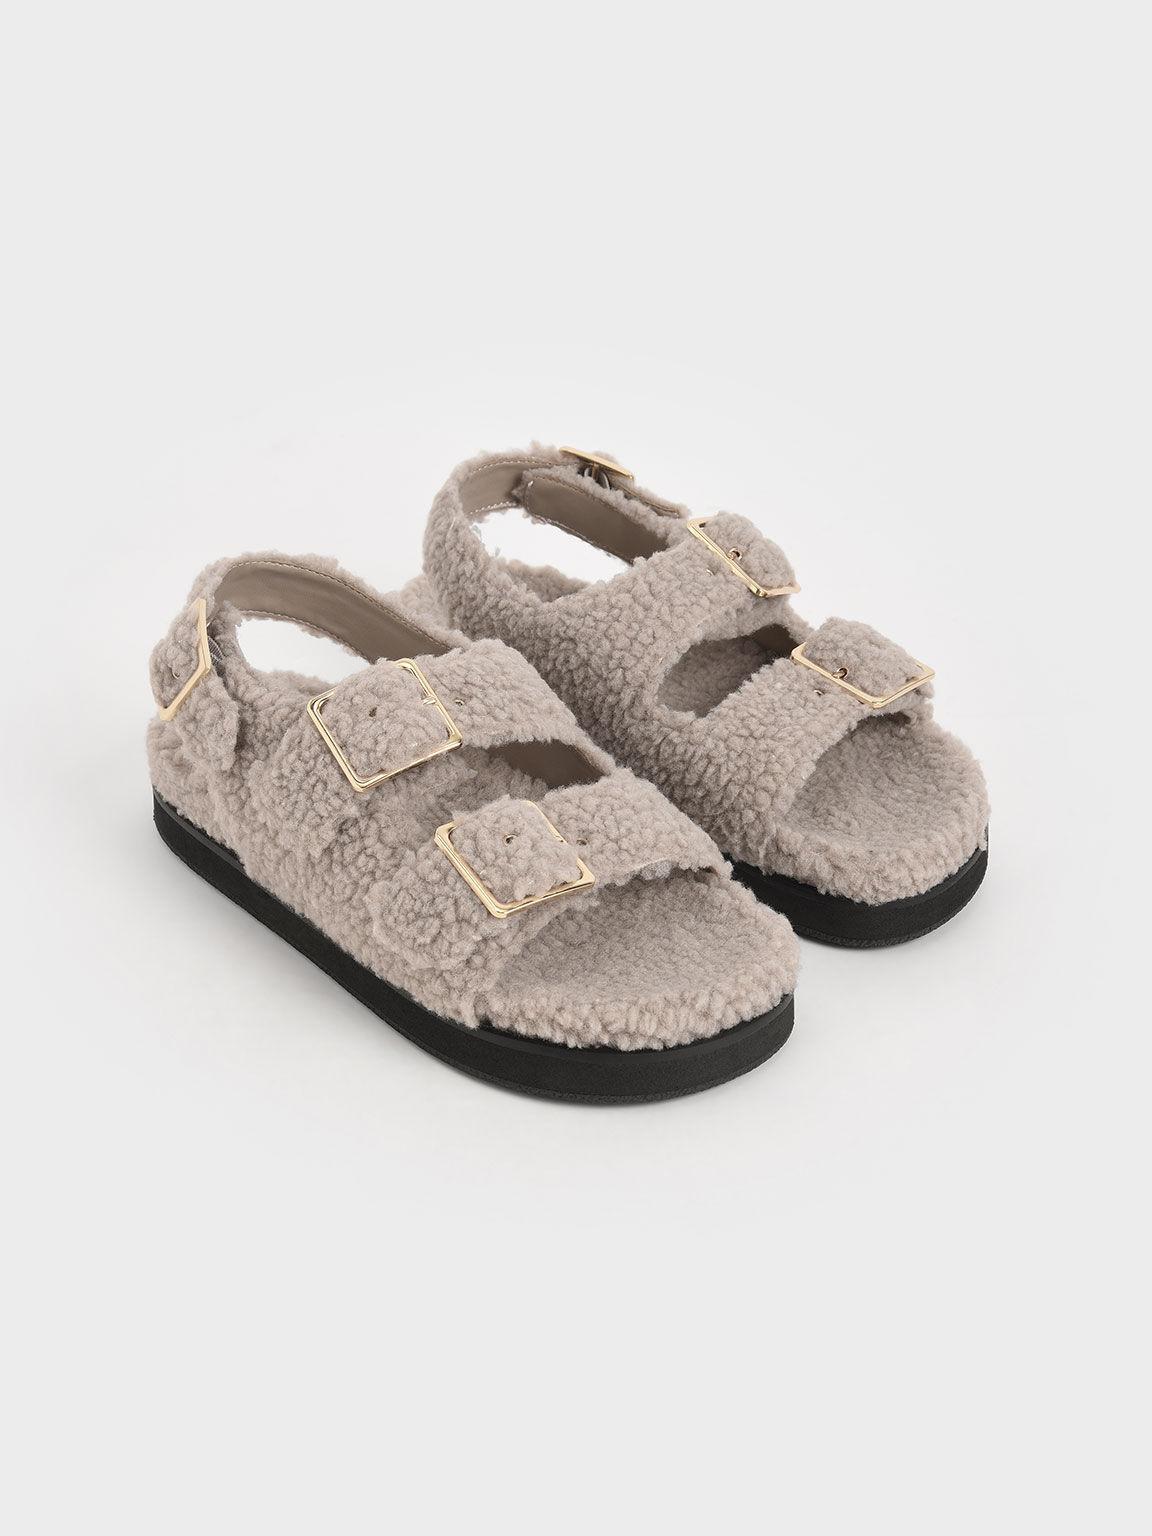 Recycled PET - Furry Platform Sandals, Taupe, hi-res